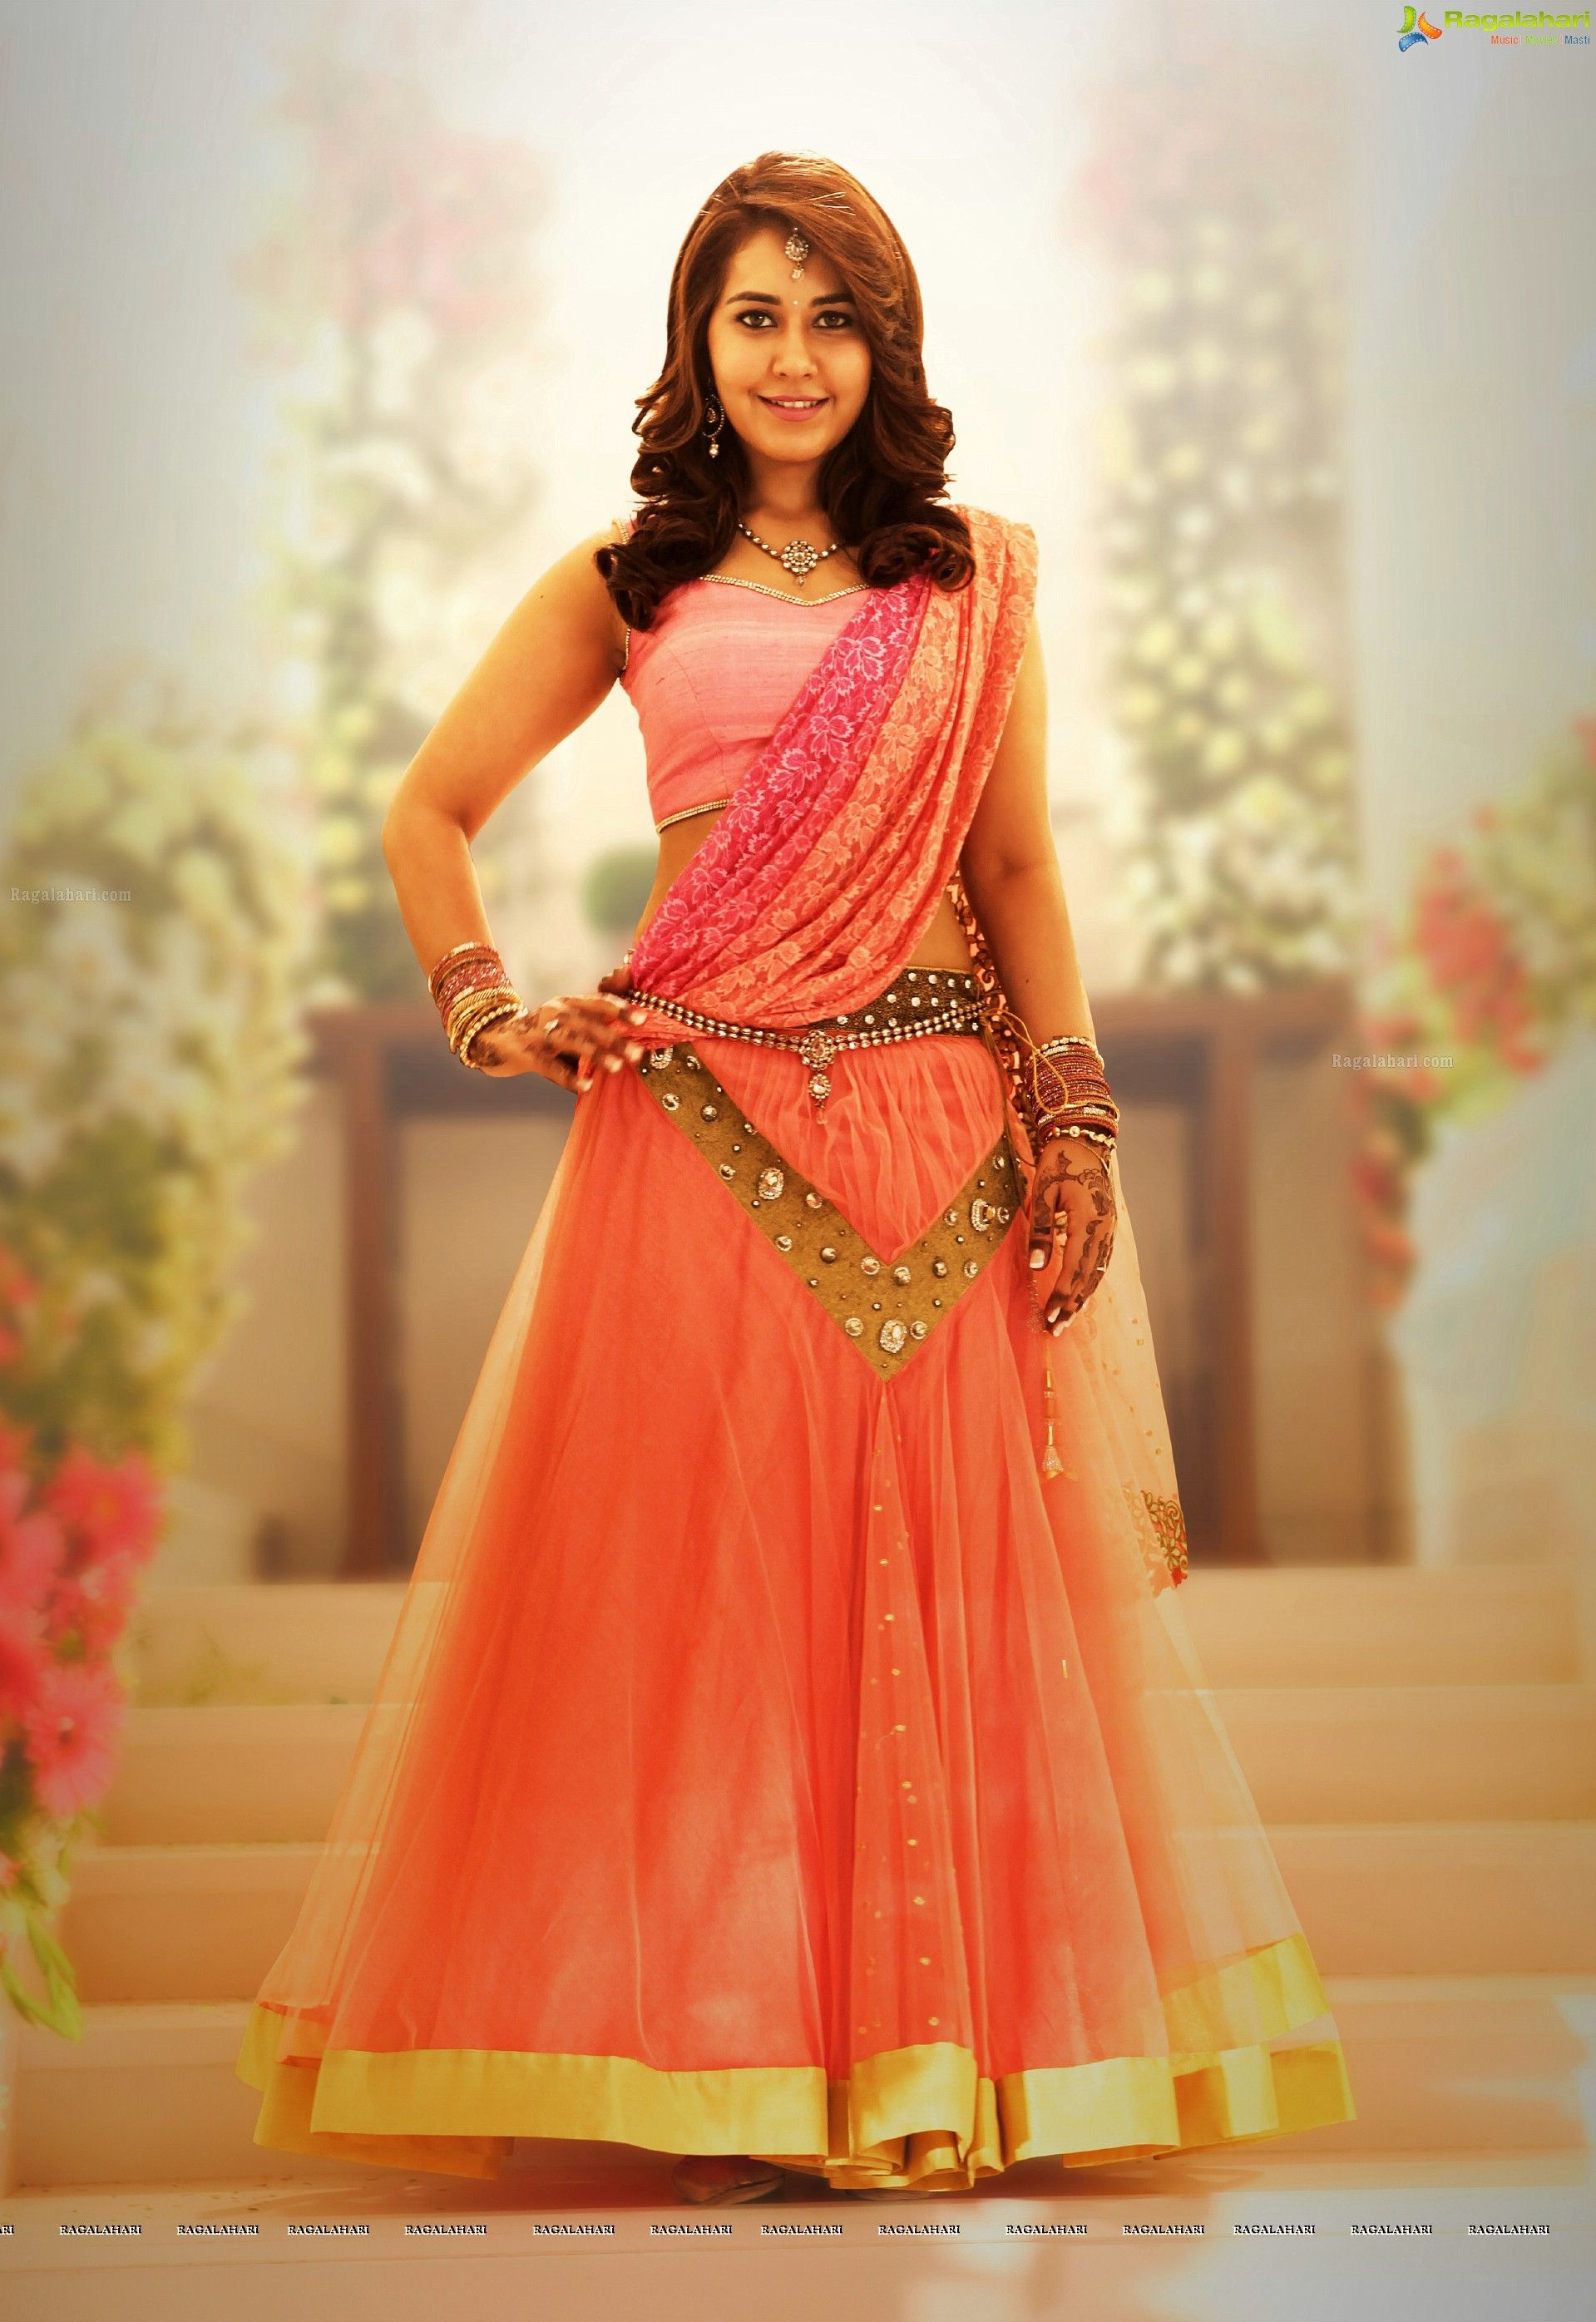 Bollywood Actress Raashi Khanna High Definition Photos - Image 1 ...